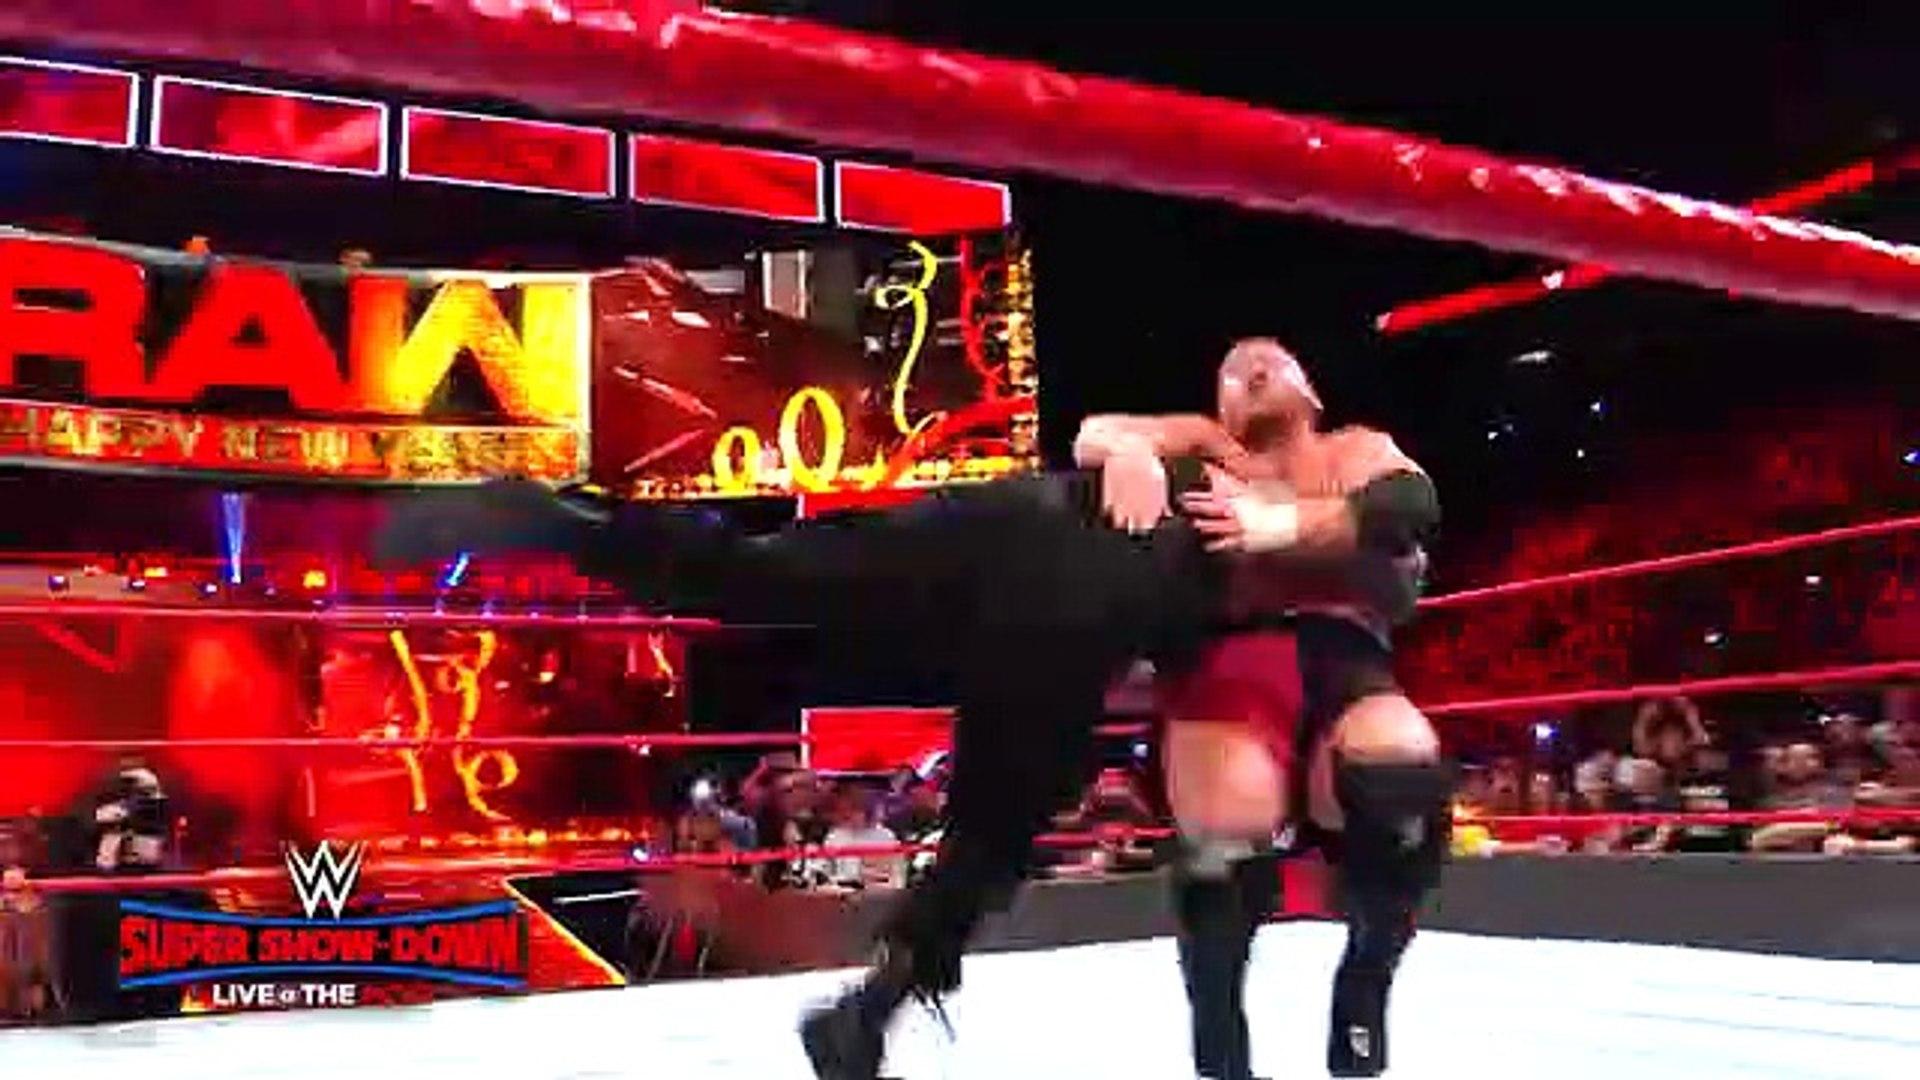 Roman Reigns will make Melbourne, Australia his yard at WWE Super Show-Down his yard